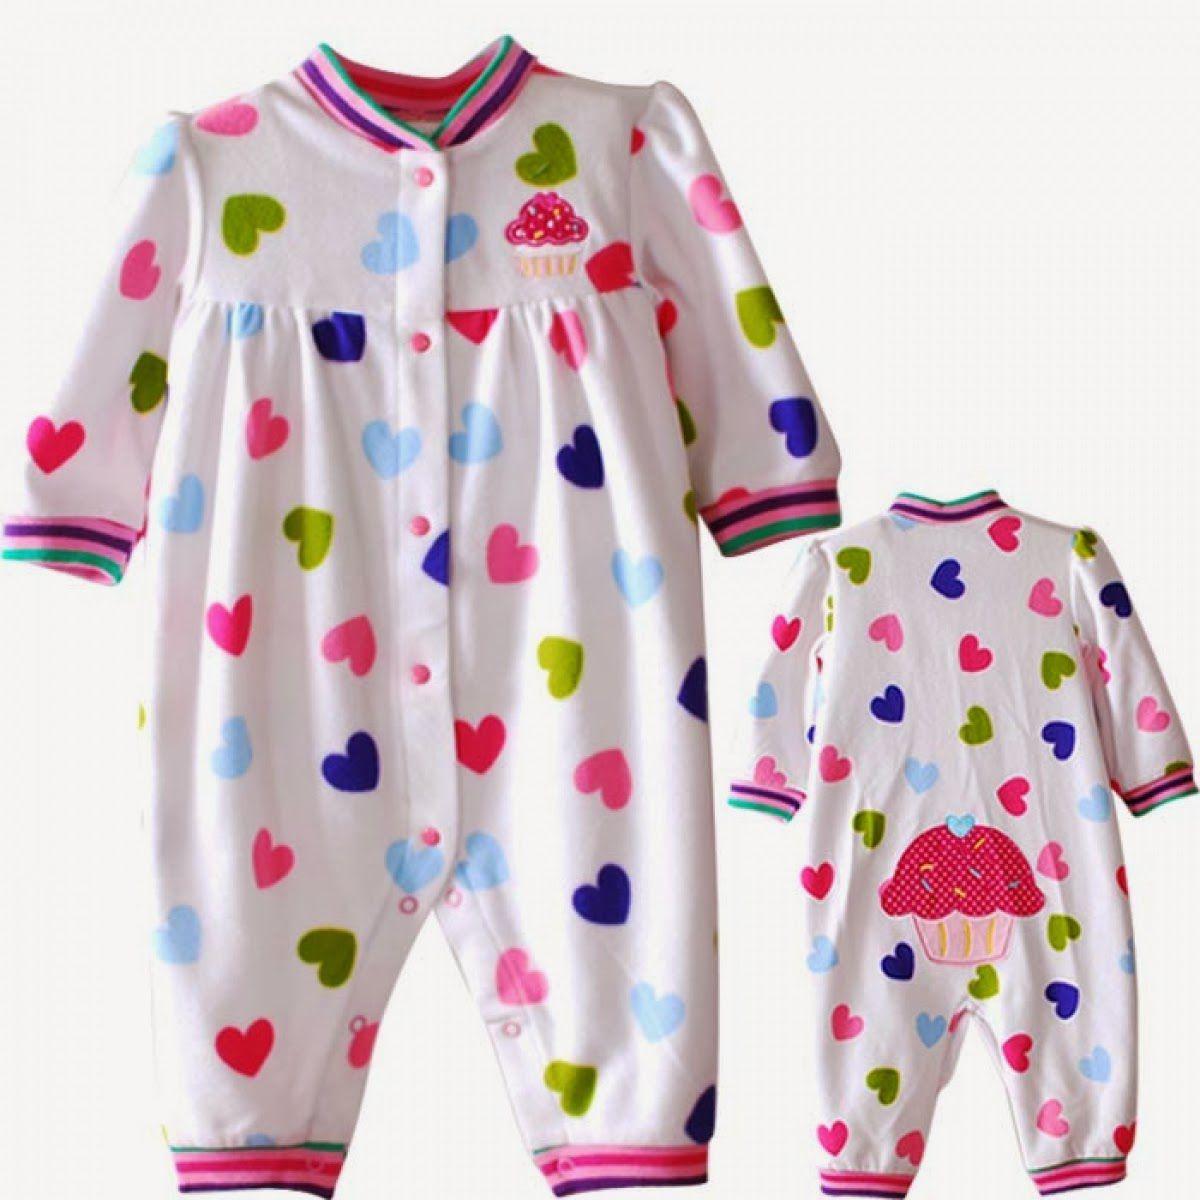 contoh baju bayi contoh model baju bayi murah terbaru,Foto Pakaian Bayi